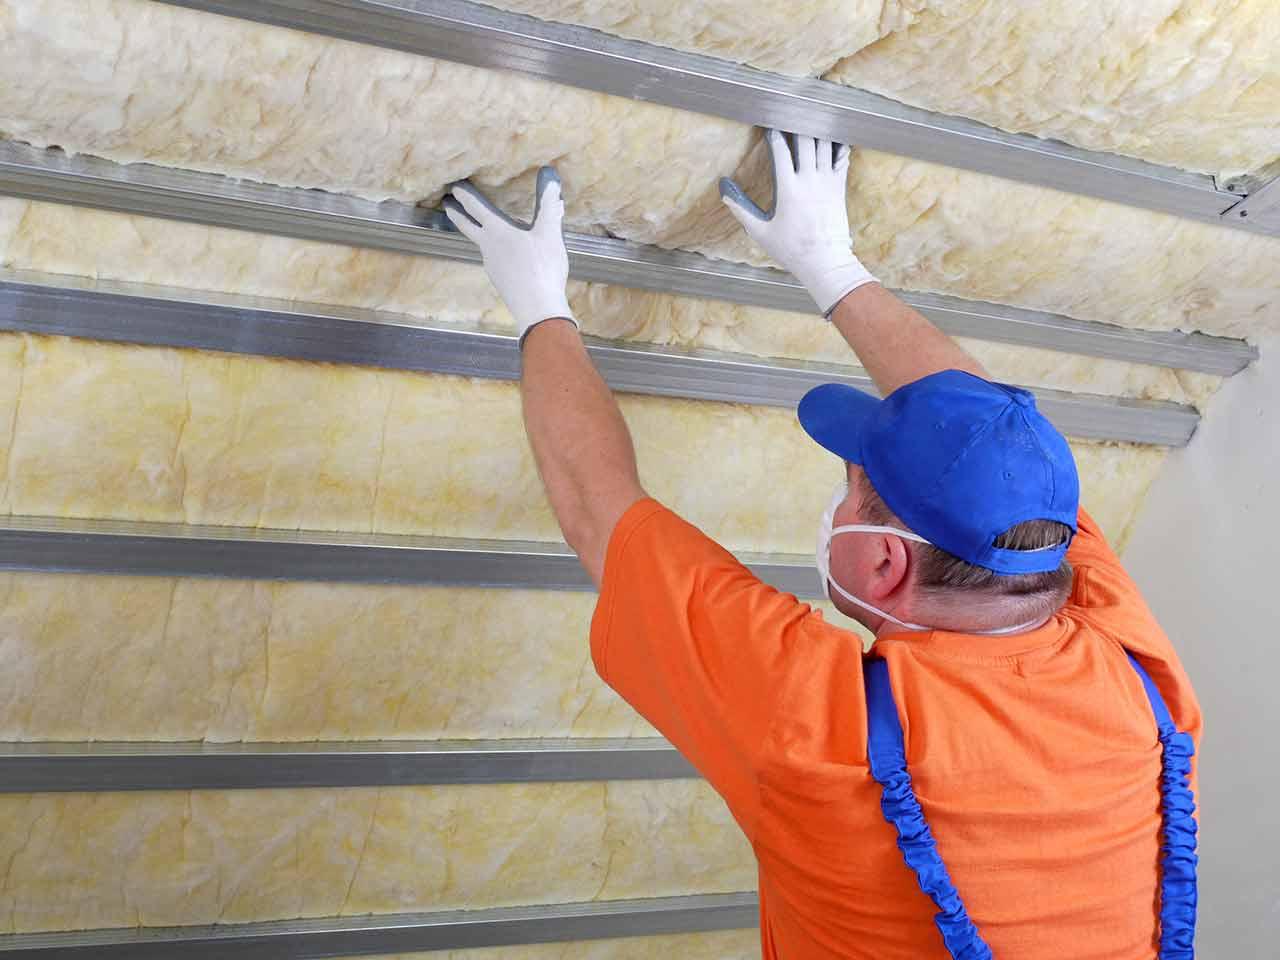 Picture of a man installing garage door insulation.